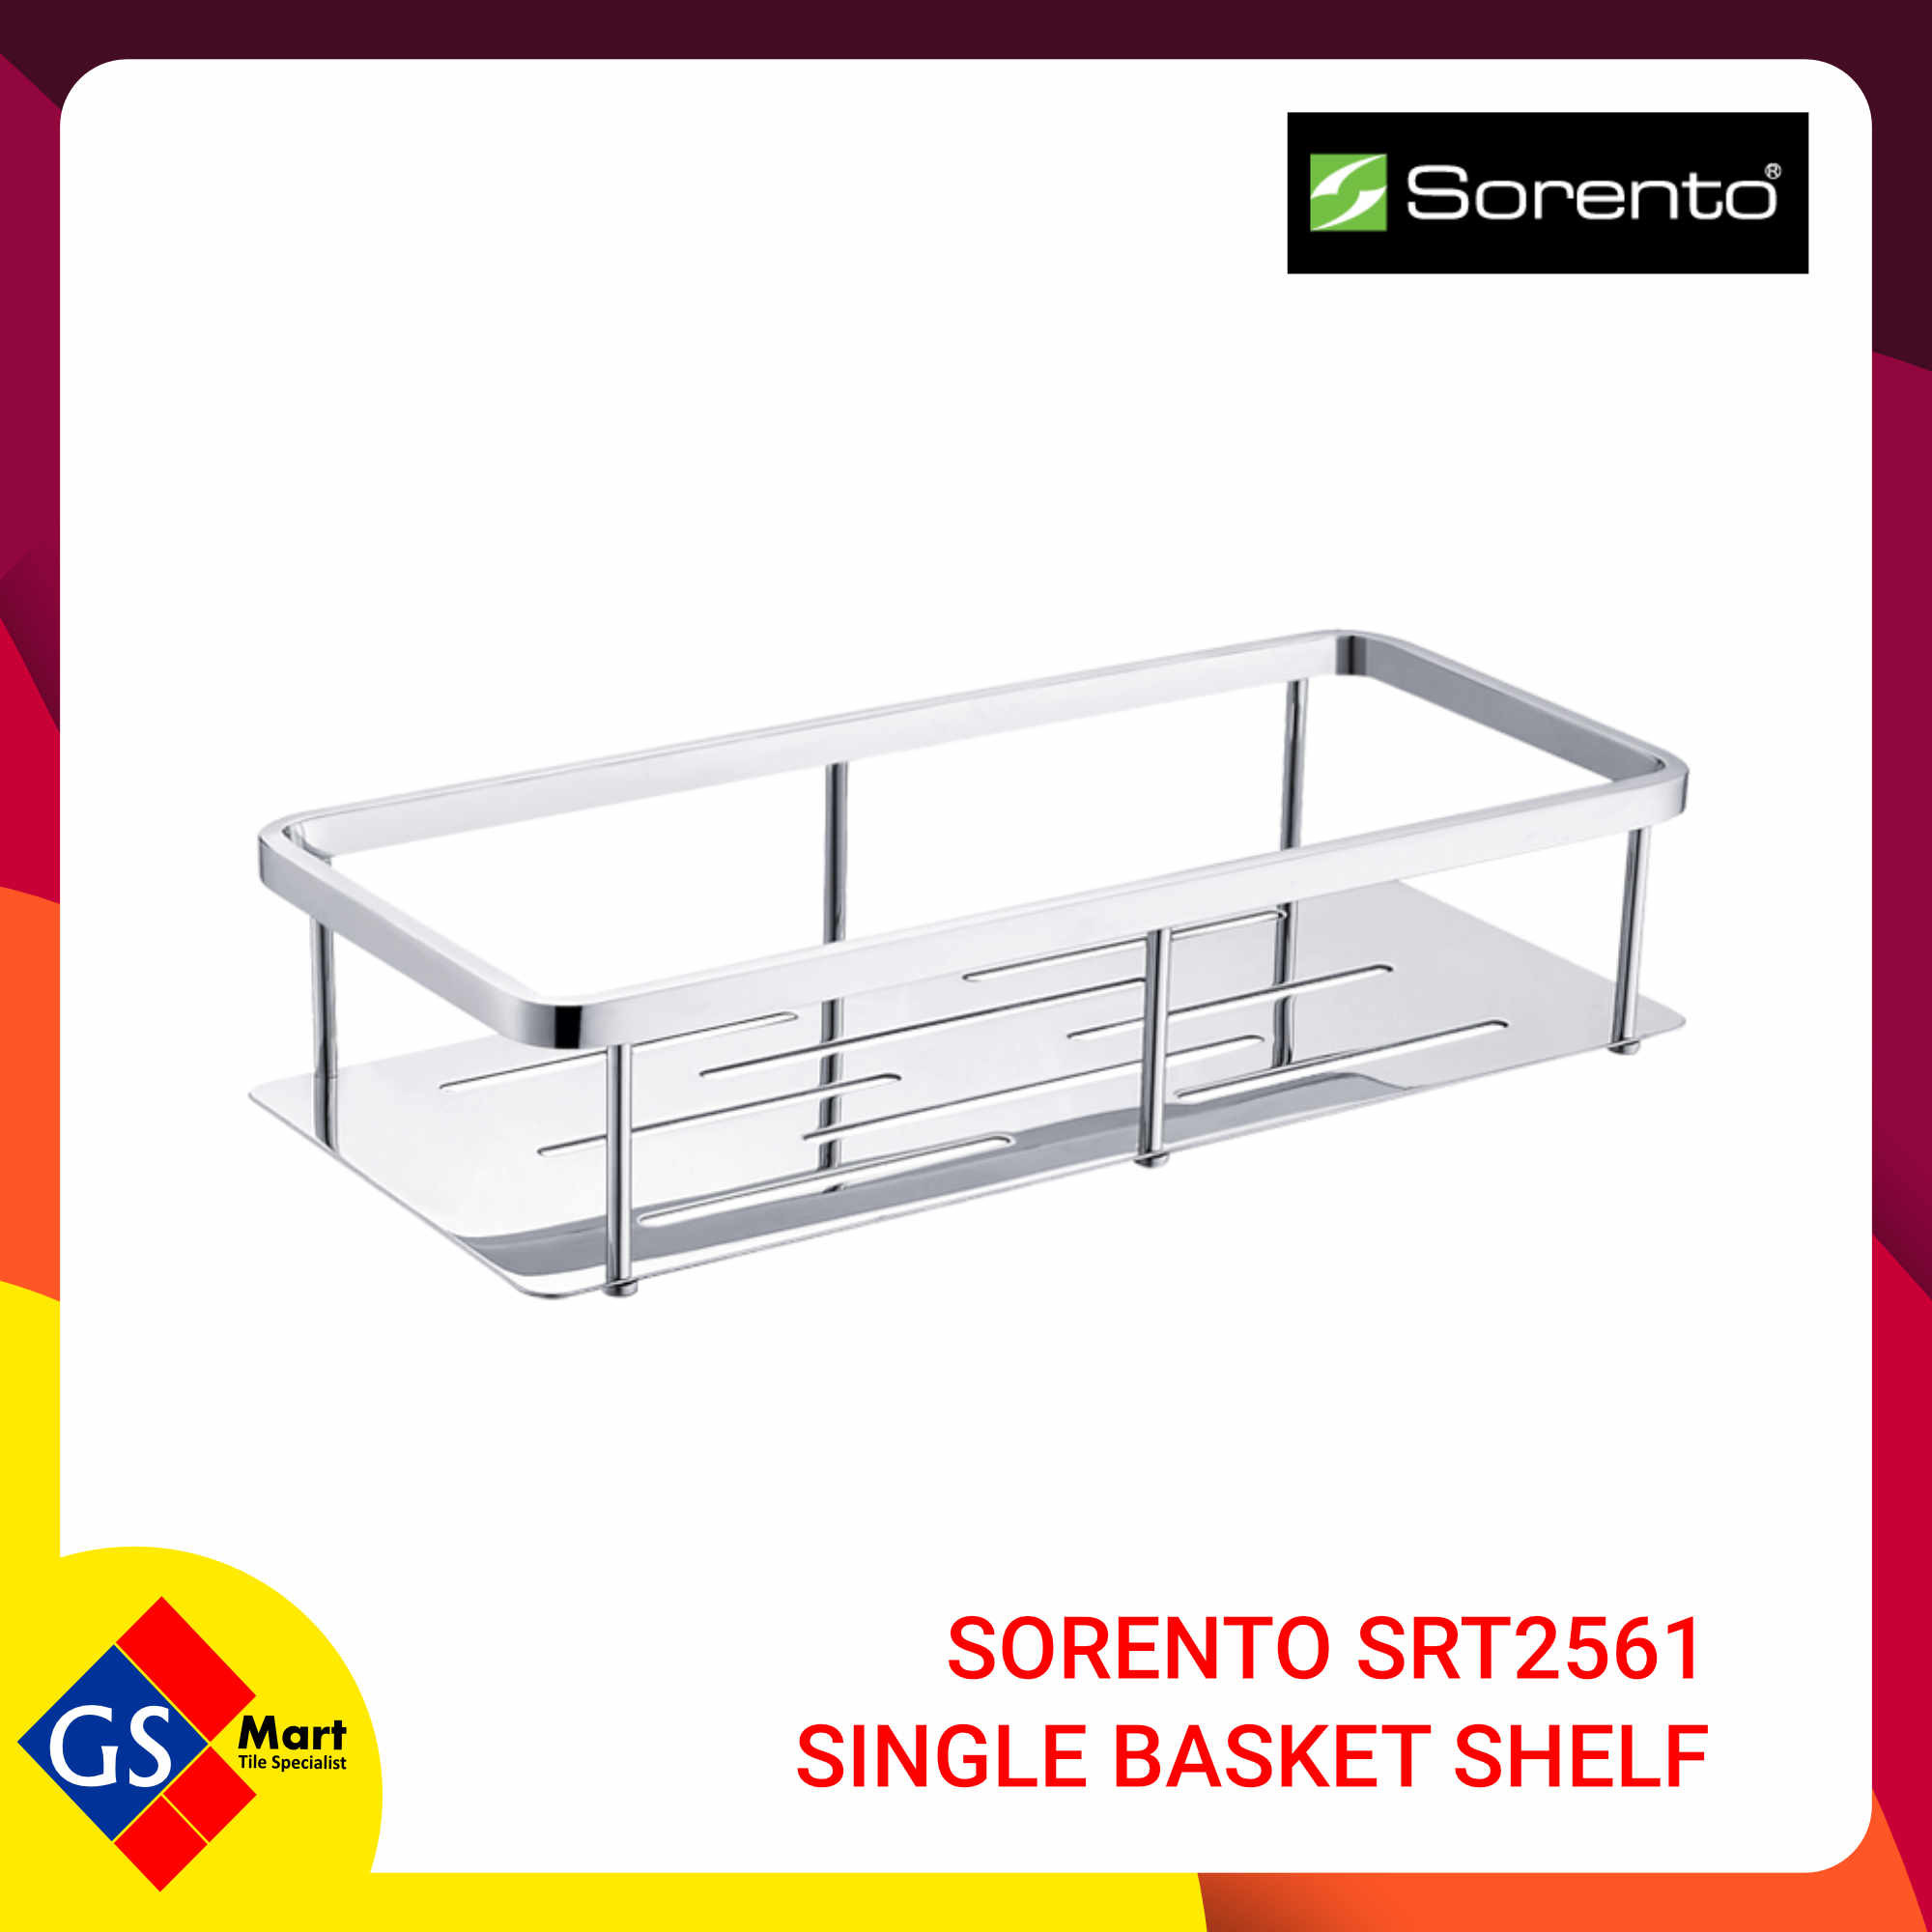 SORENTO SRT2561 SINGLE BASKET SHELF